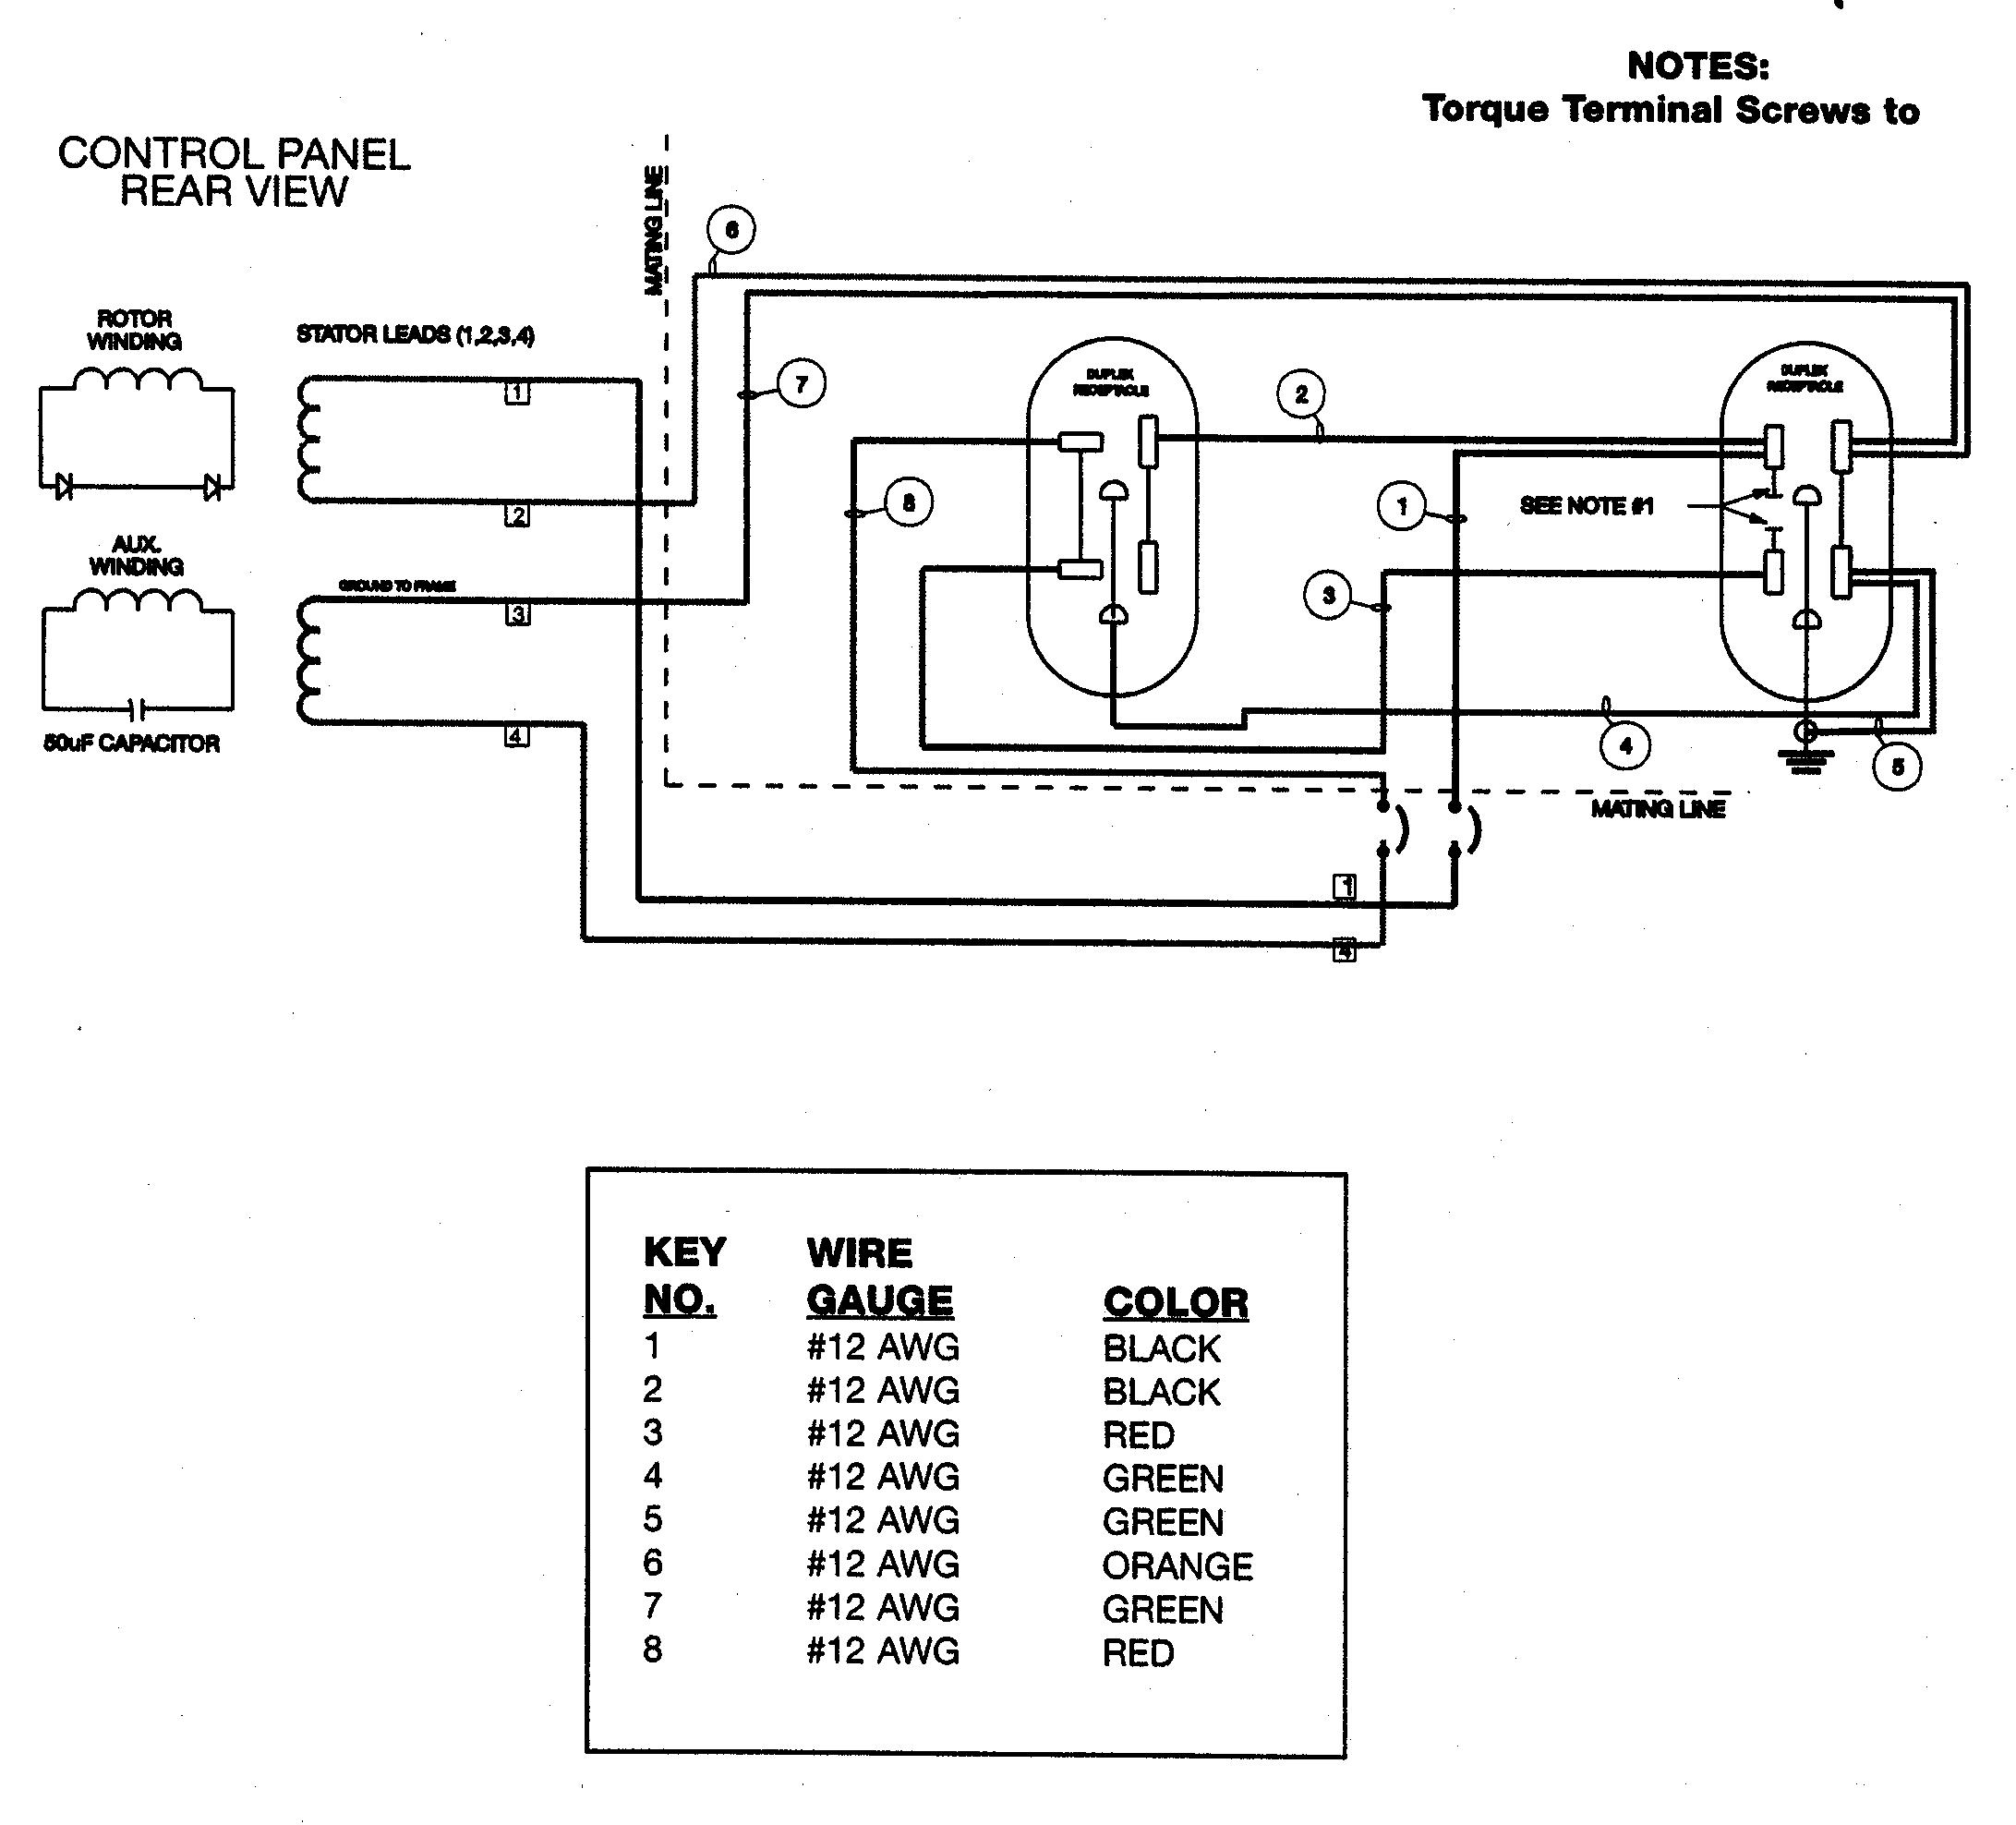 l14-30 wiring diagram - Wiring Diagram